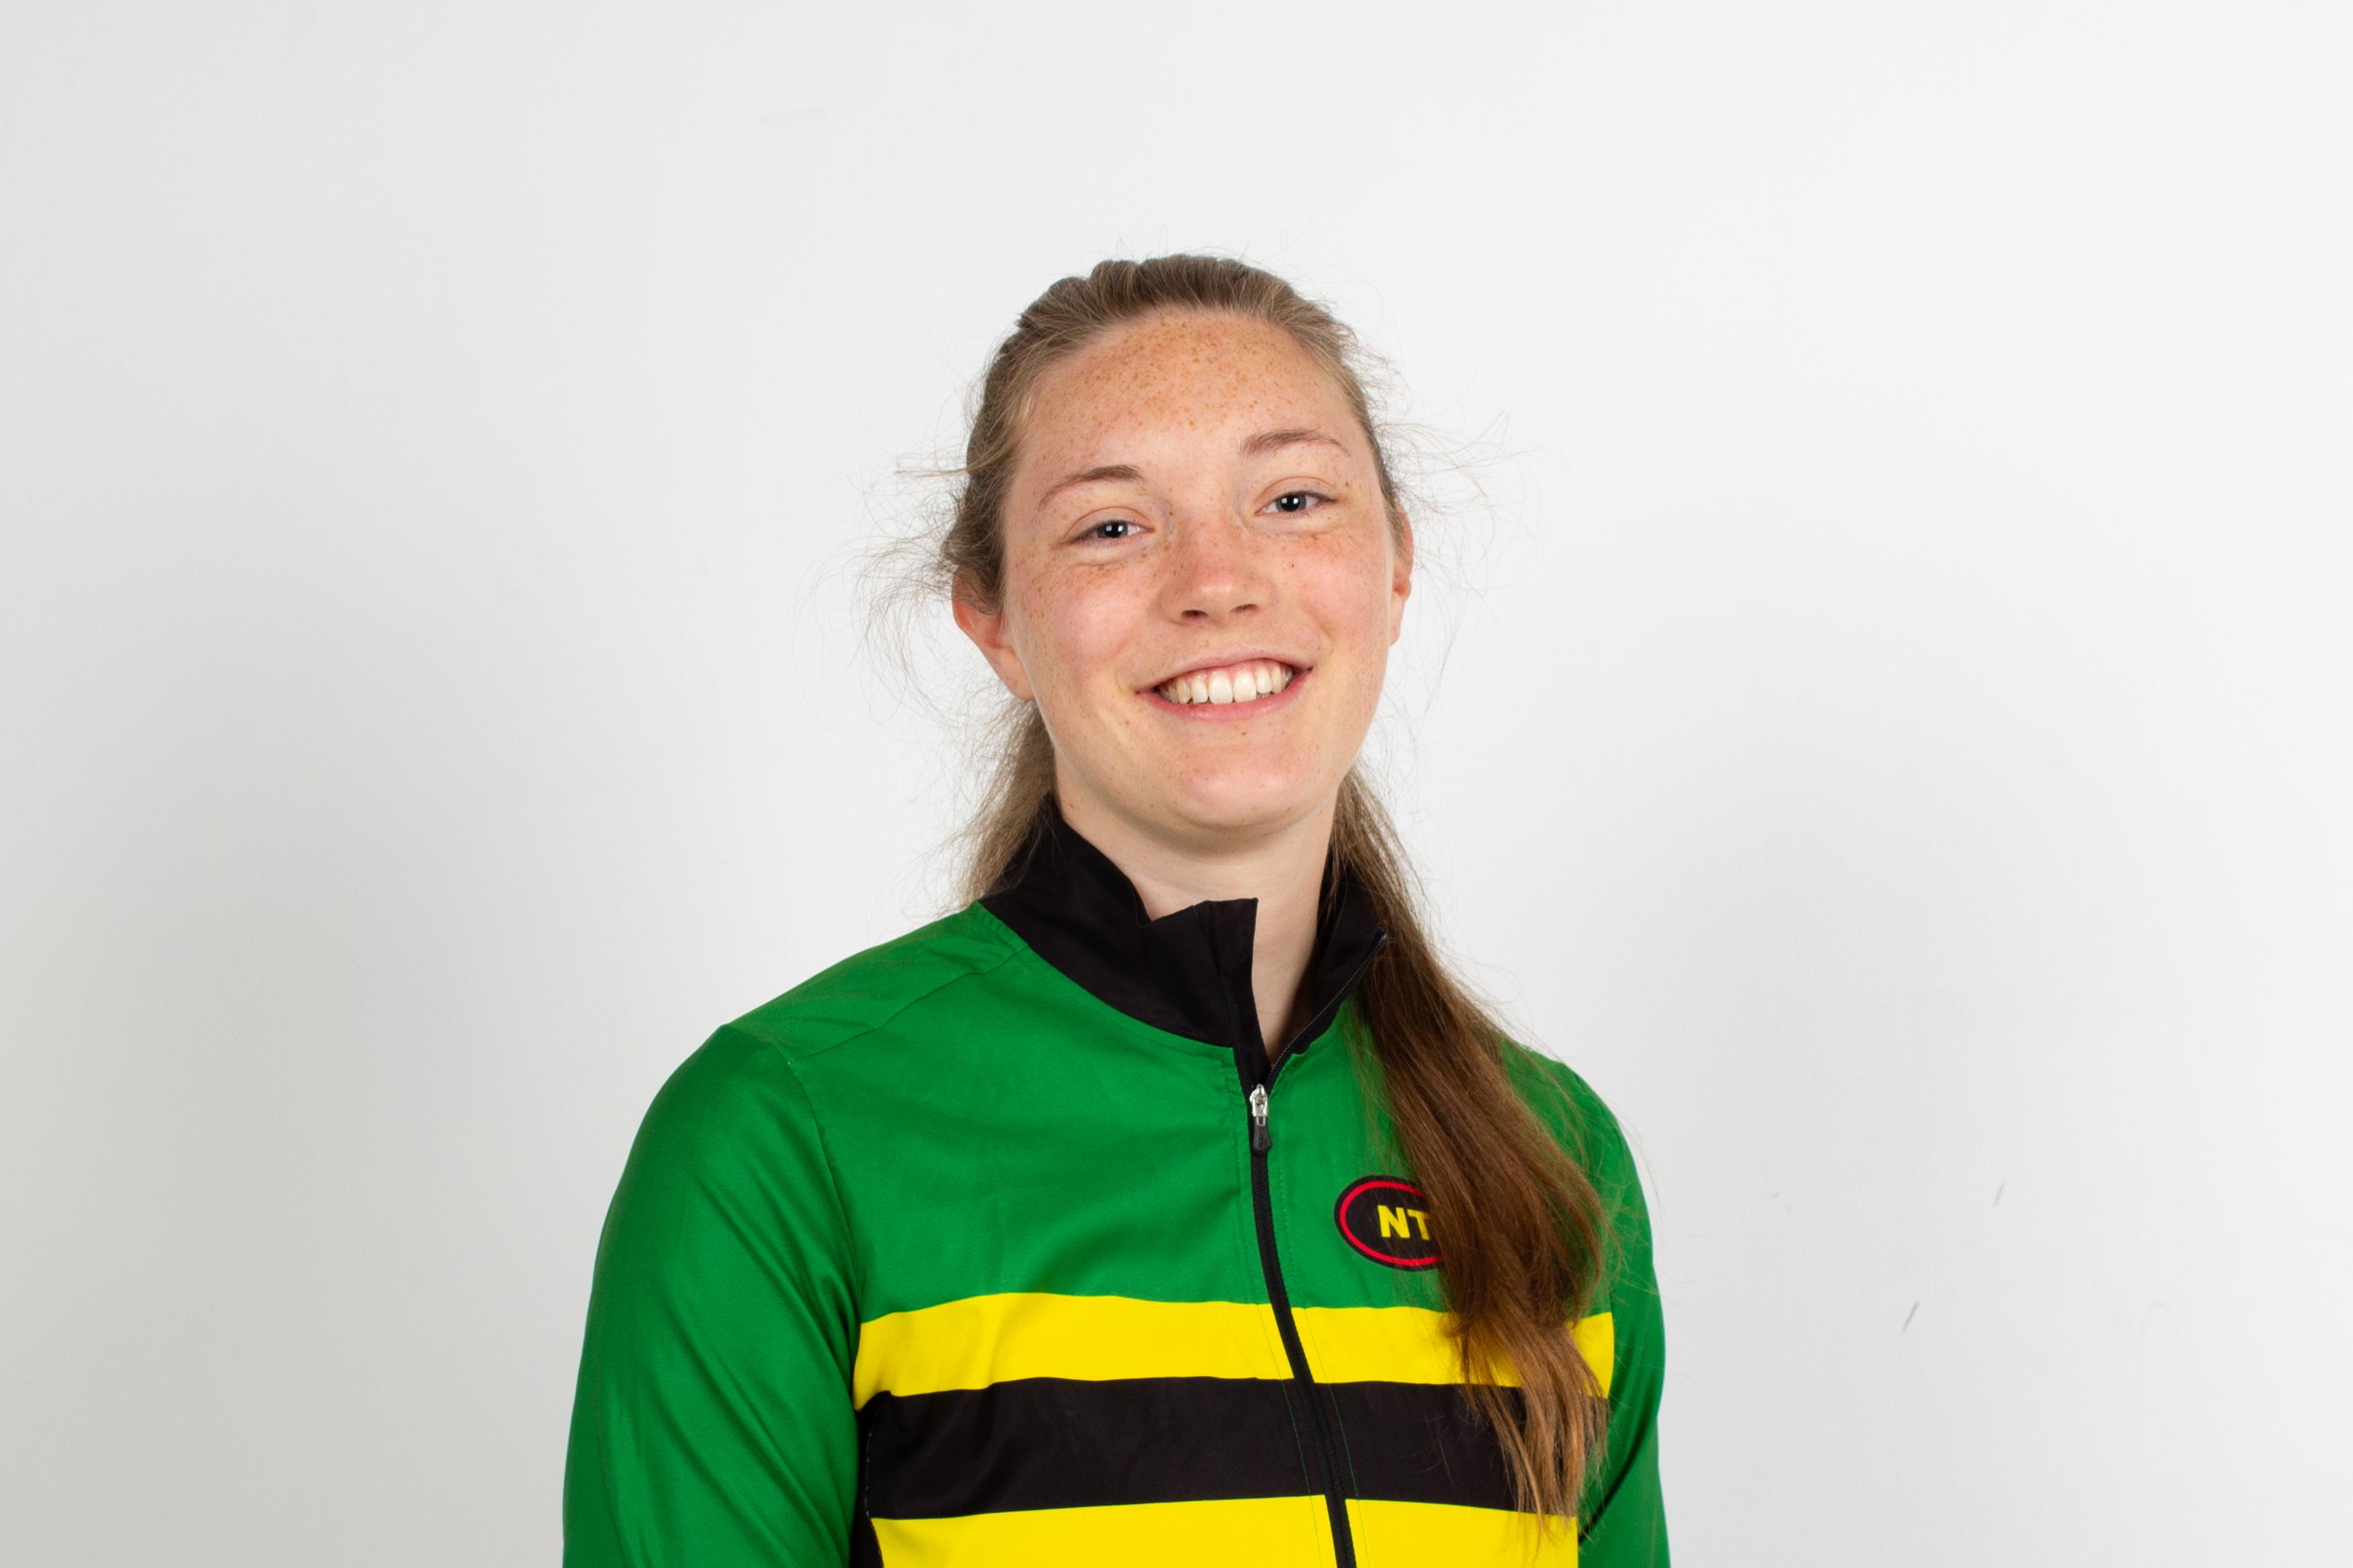 Martine Furnes Pettersen